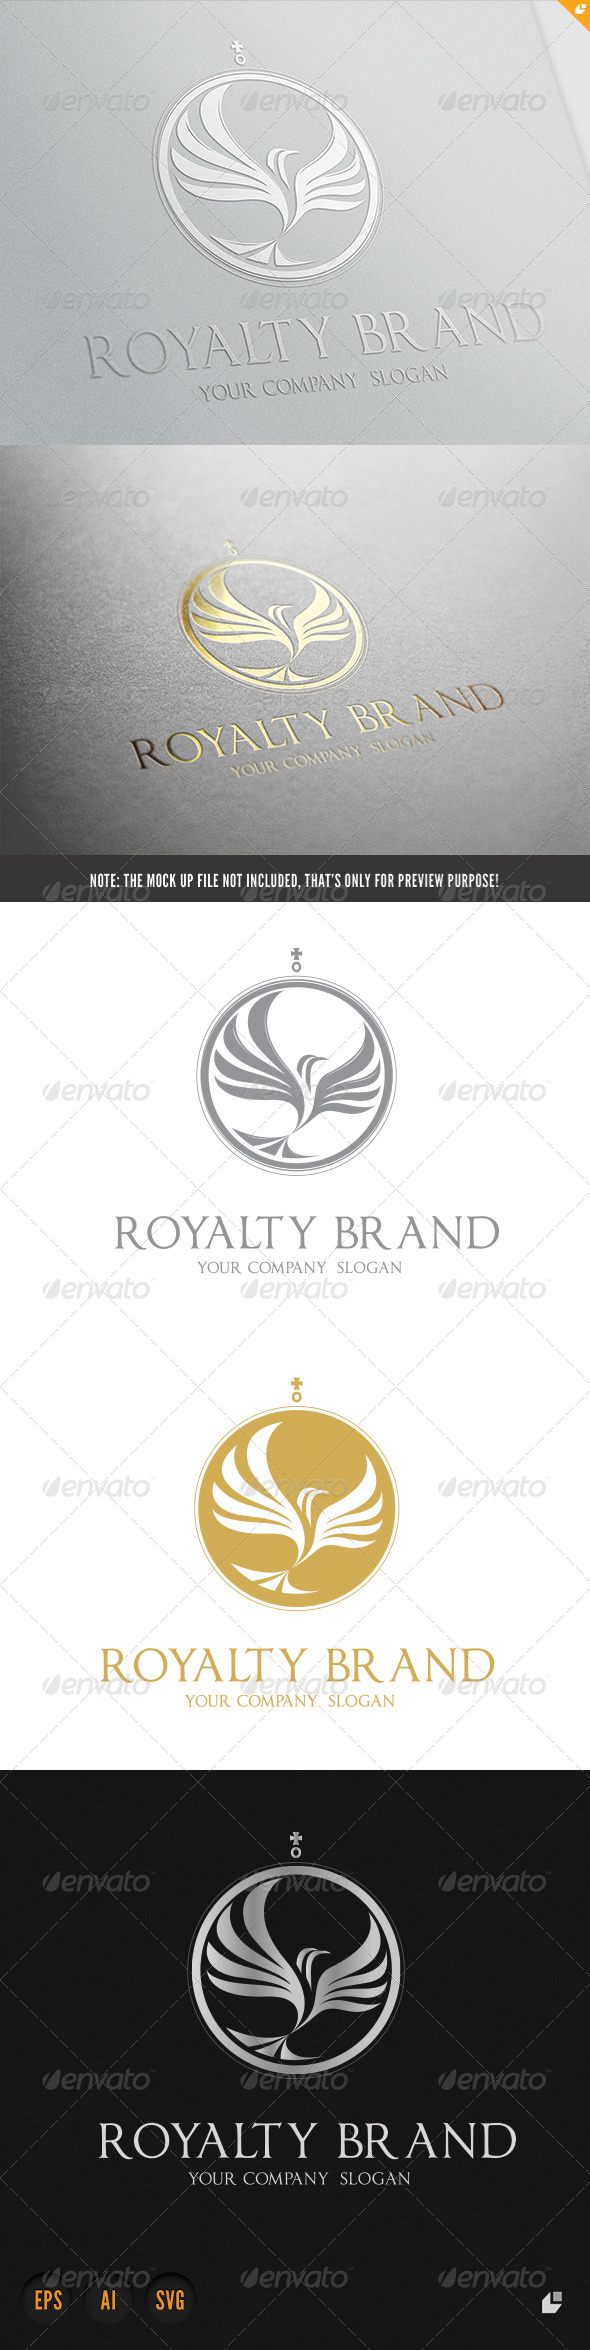 Royalty Brand - Crests Logo Templates